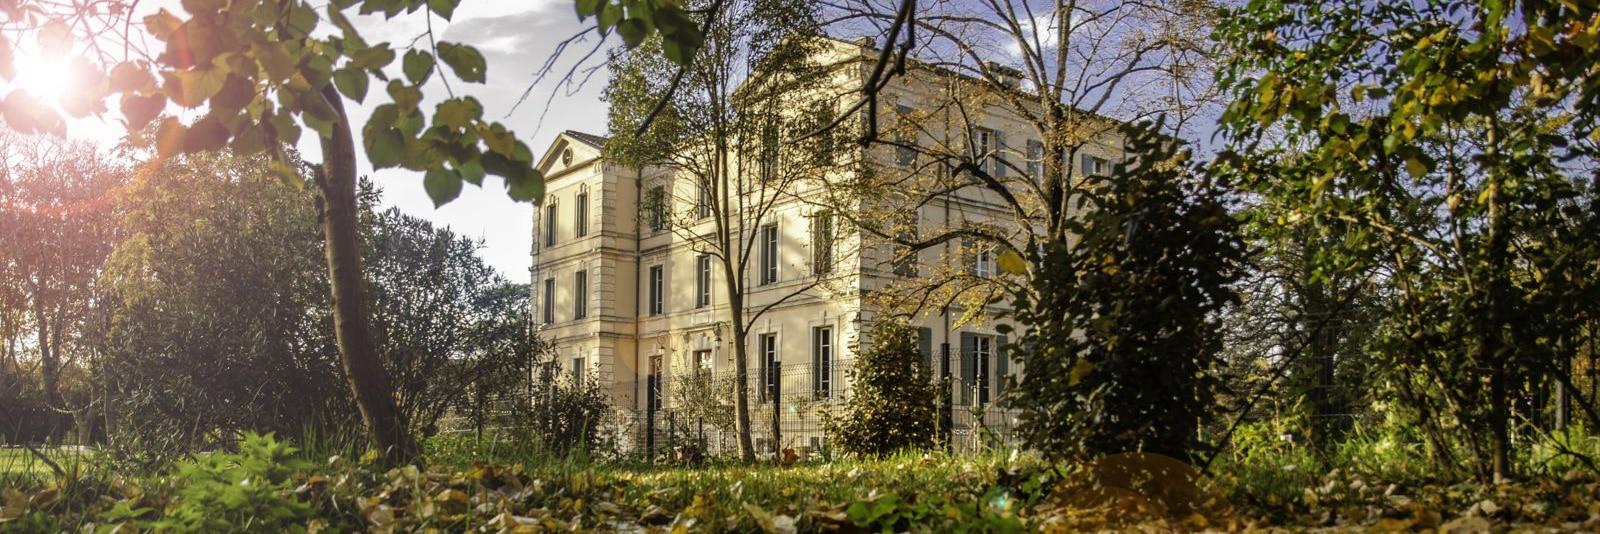 Hotel Château de Montcaud in autumn, Provence France